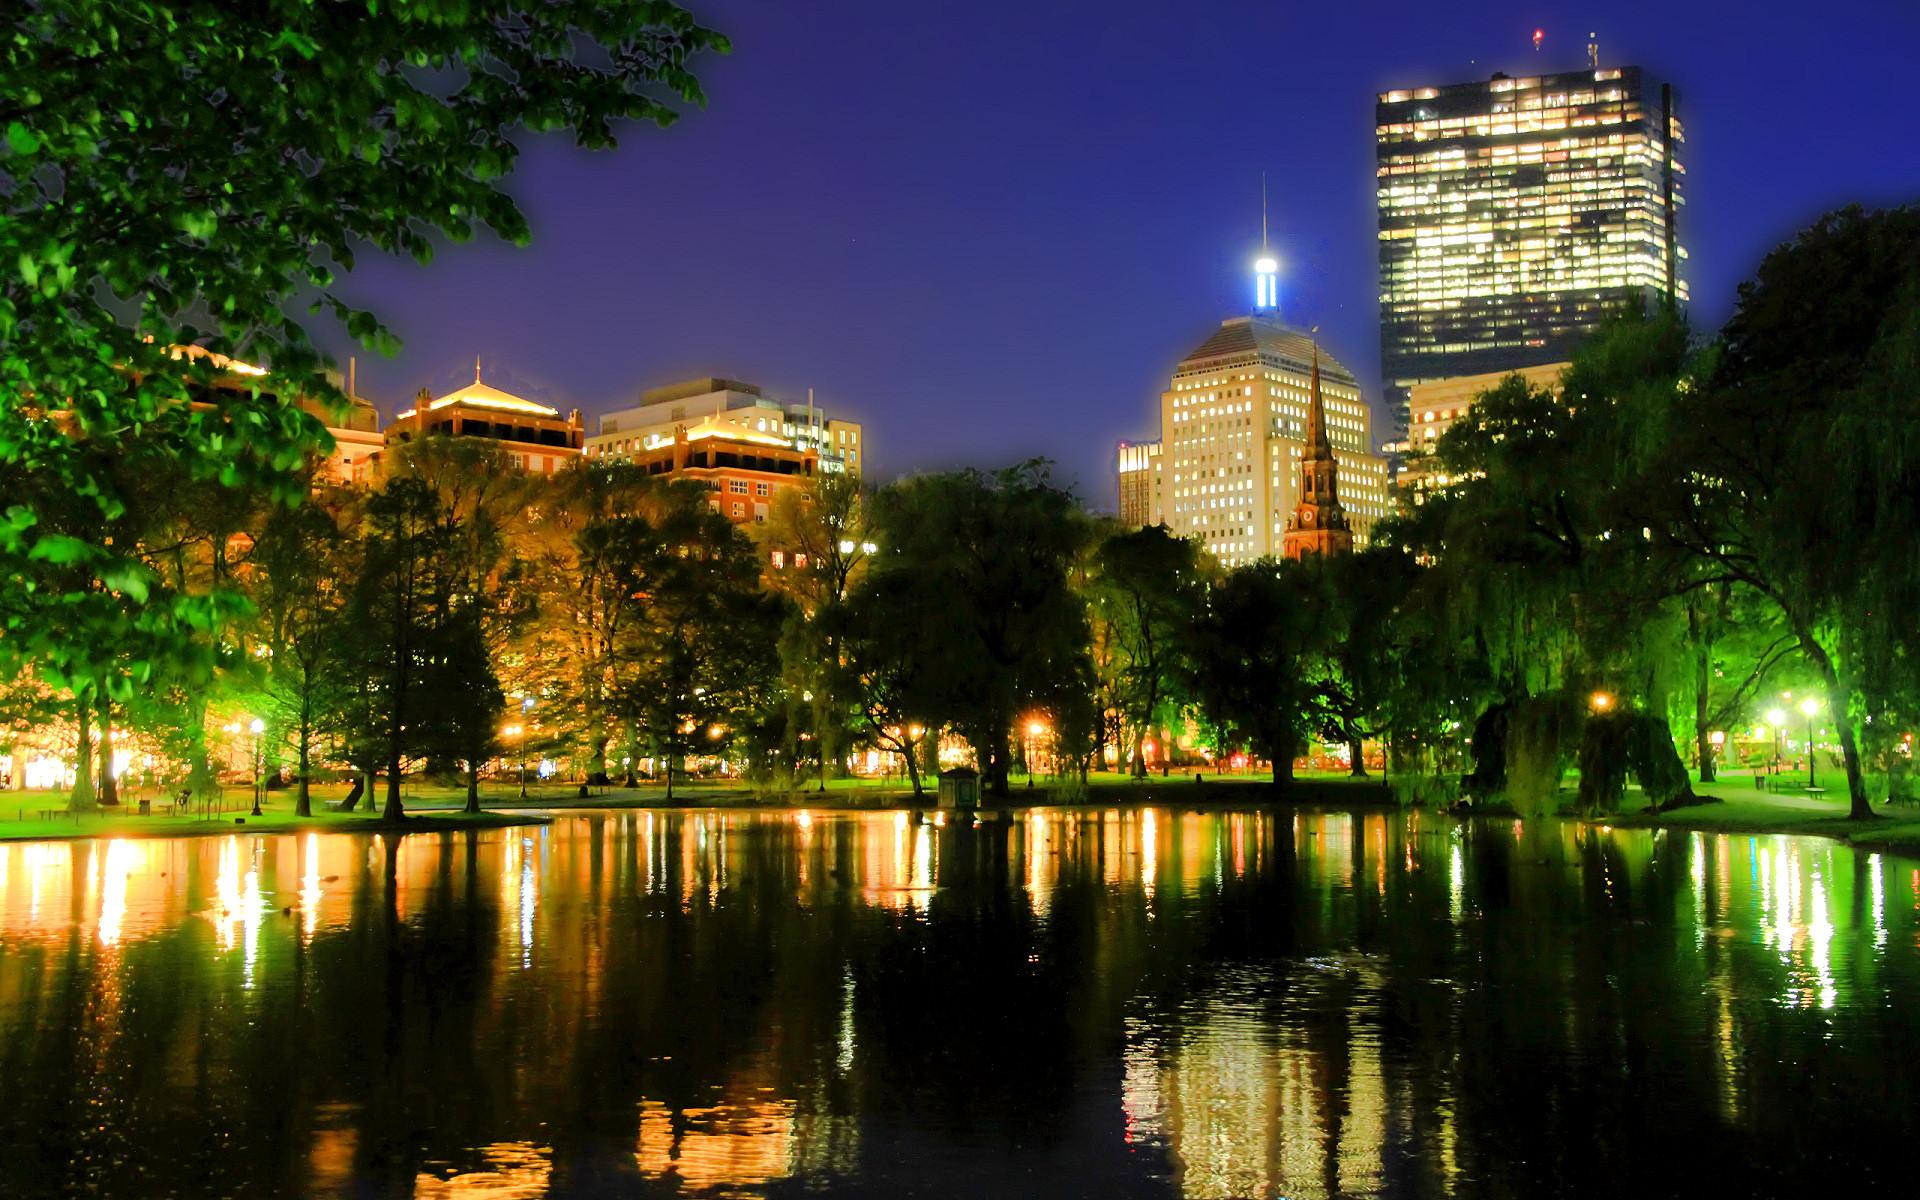 Boston City Night Skyline Hd Wallpaper Free Download | Daily Pics .